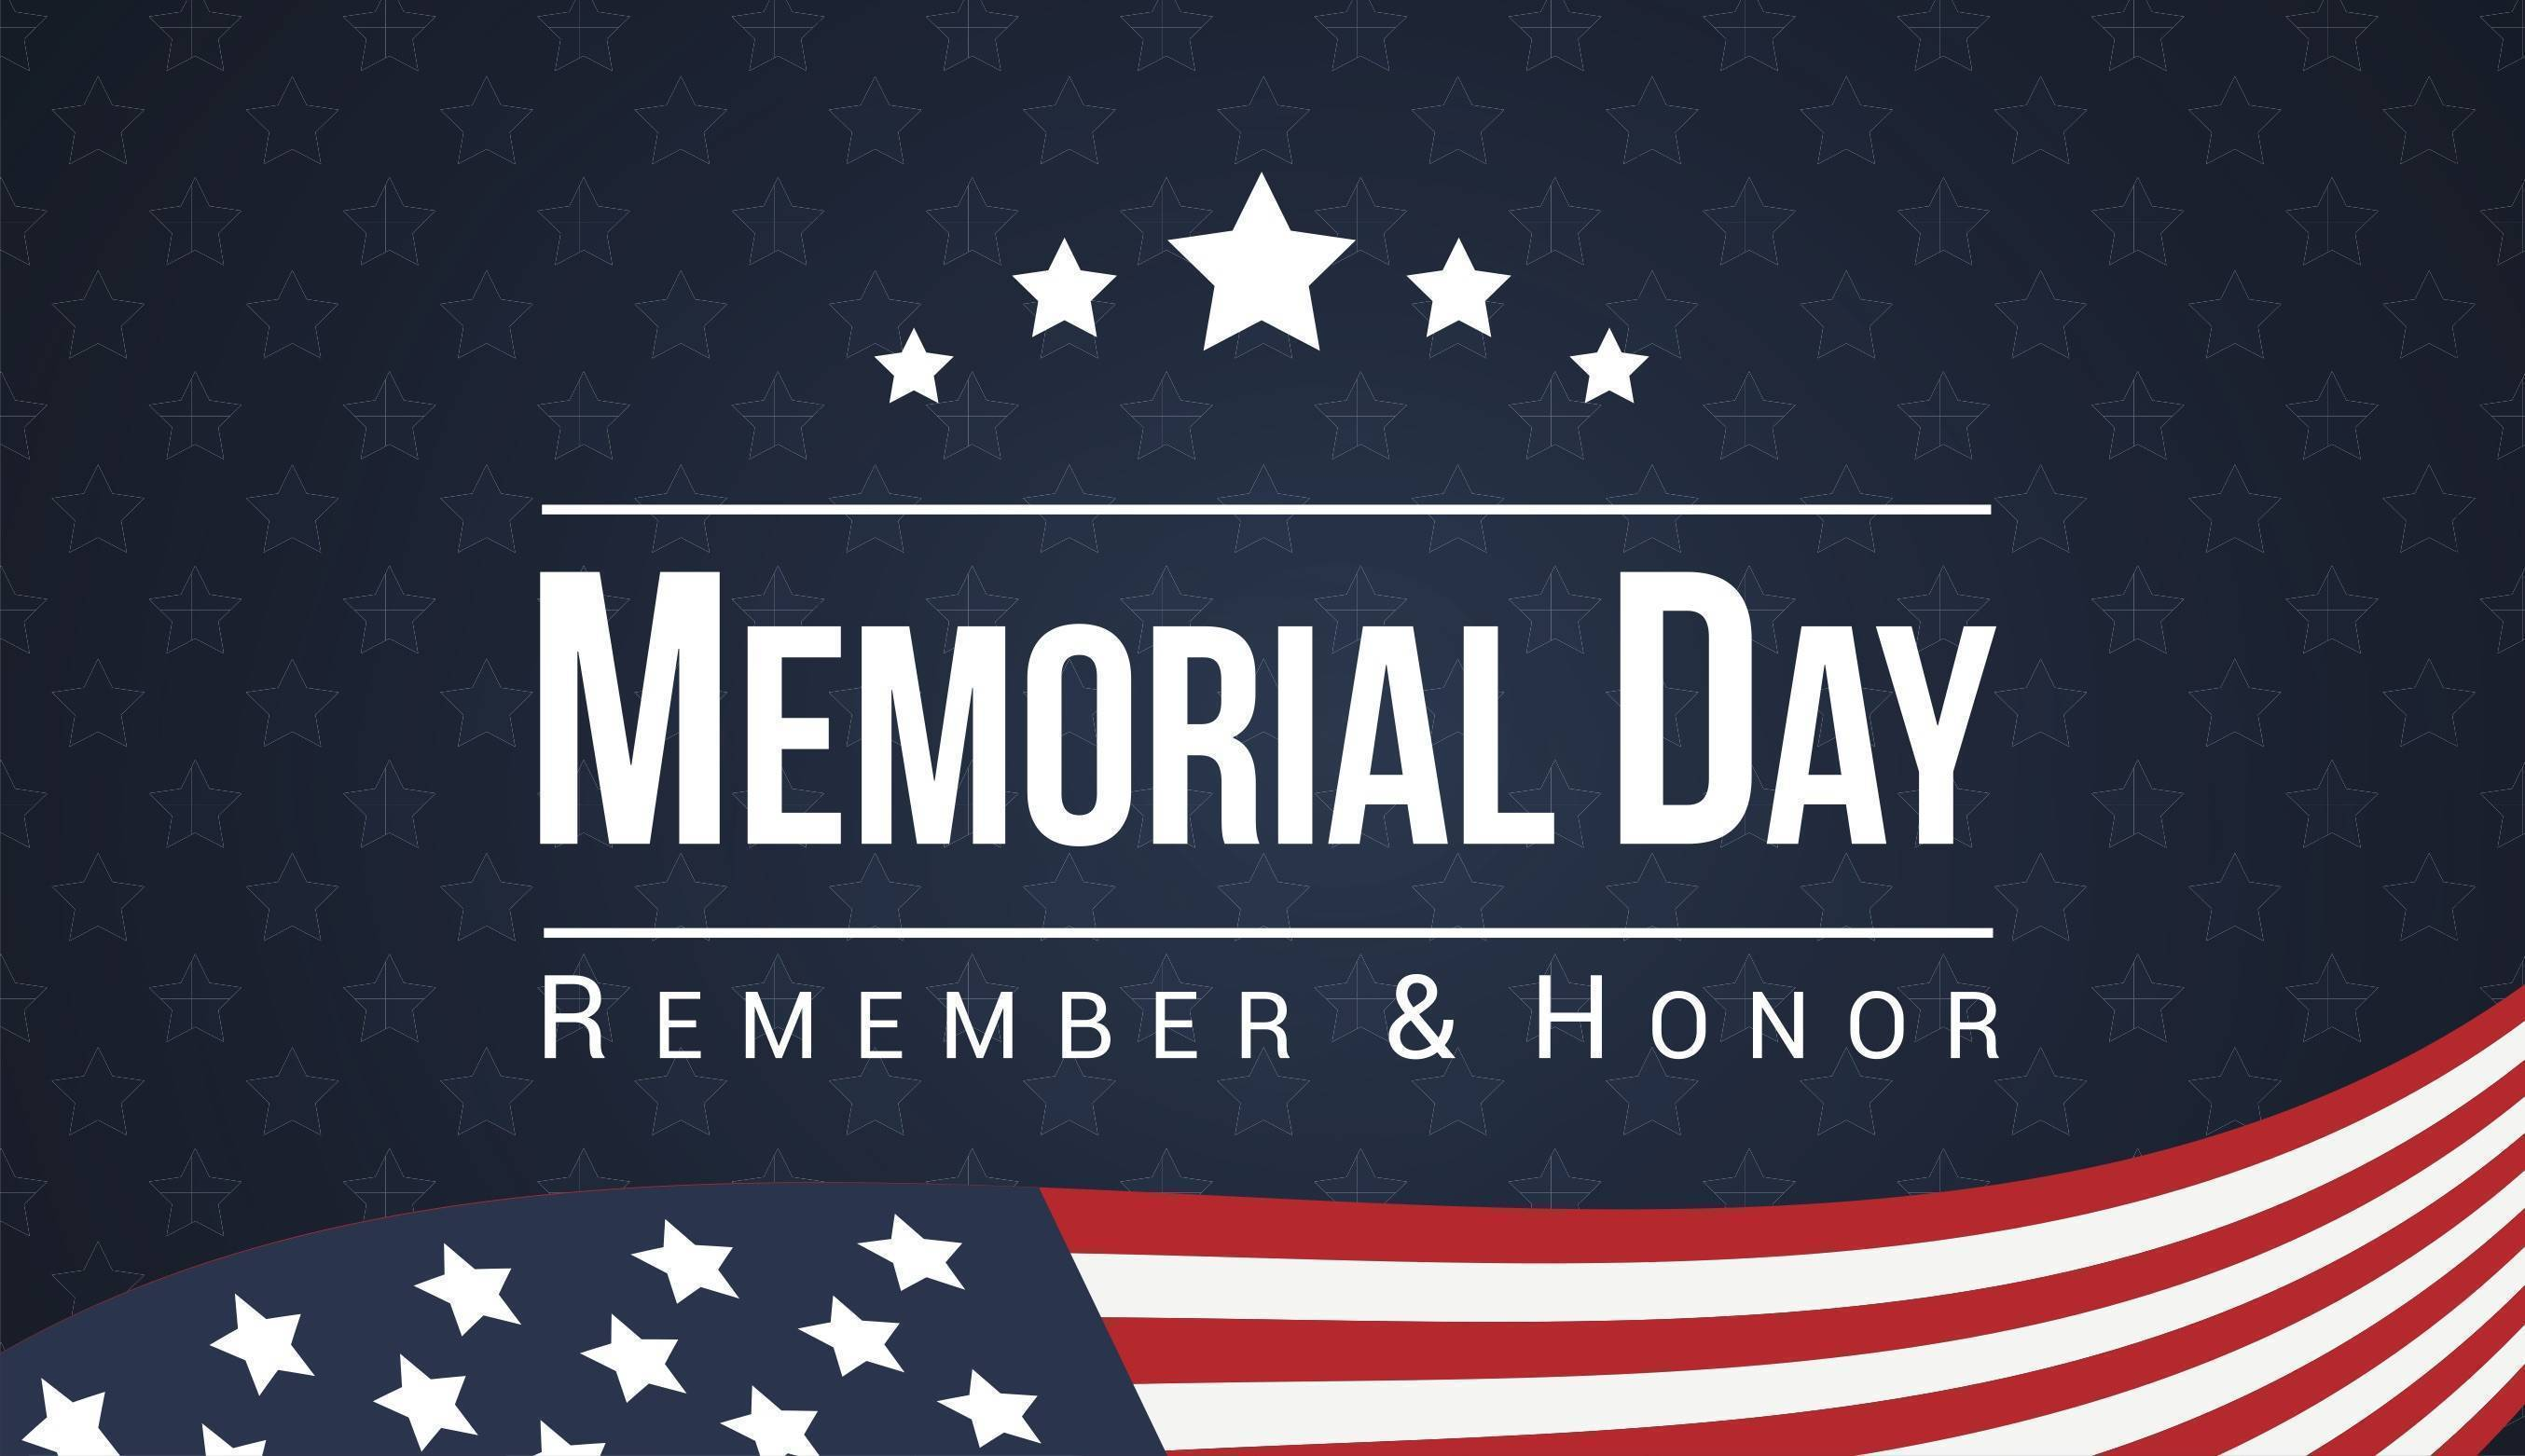 hawthorne memorial day service & parade | tapinto